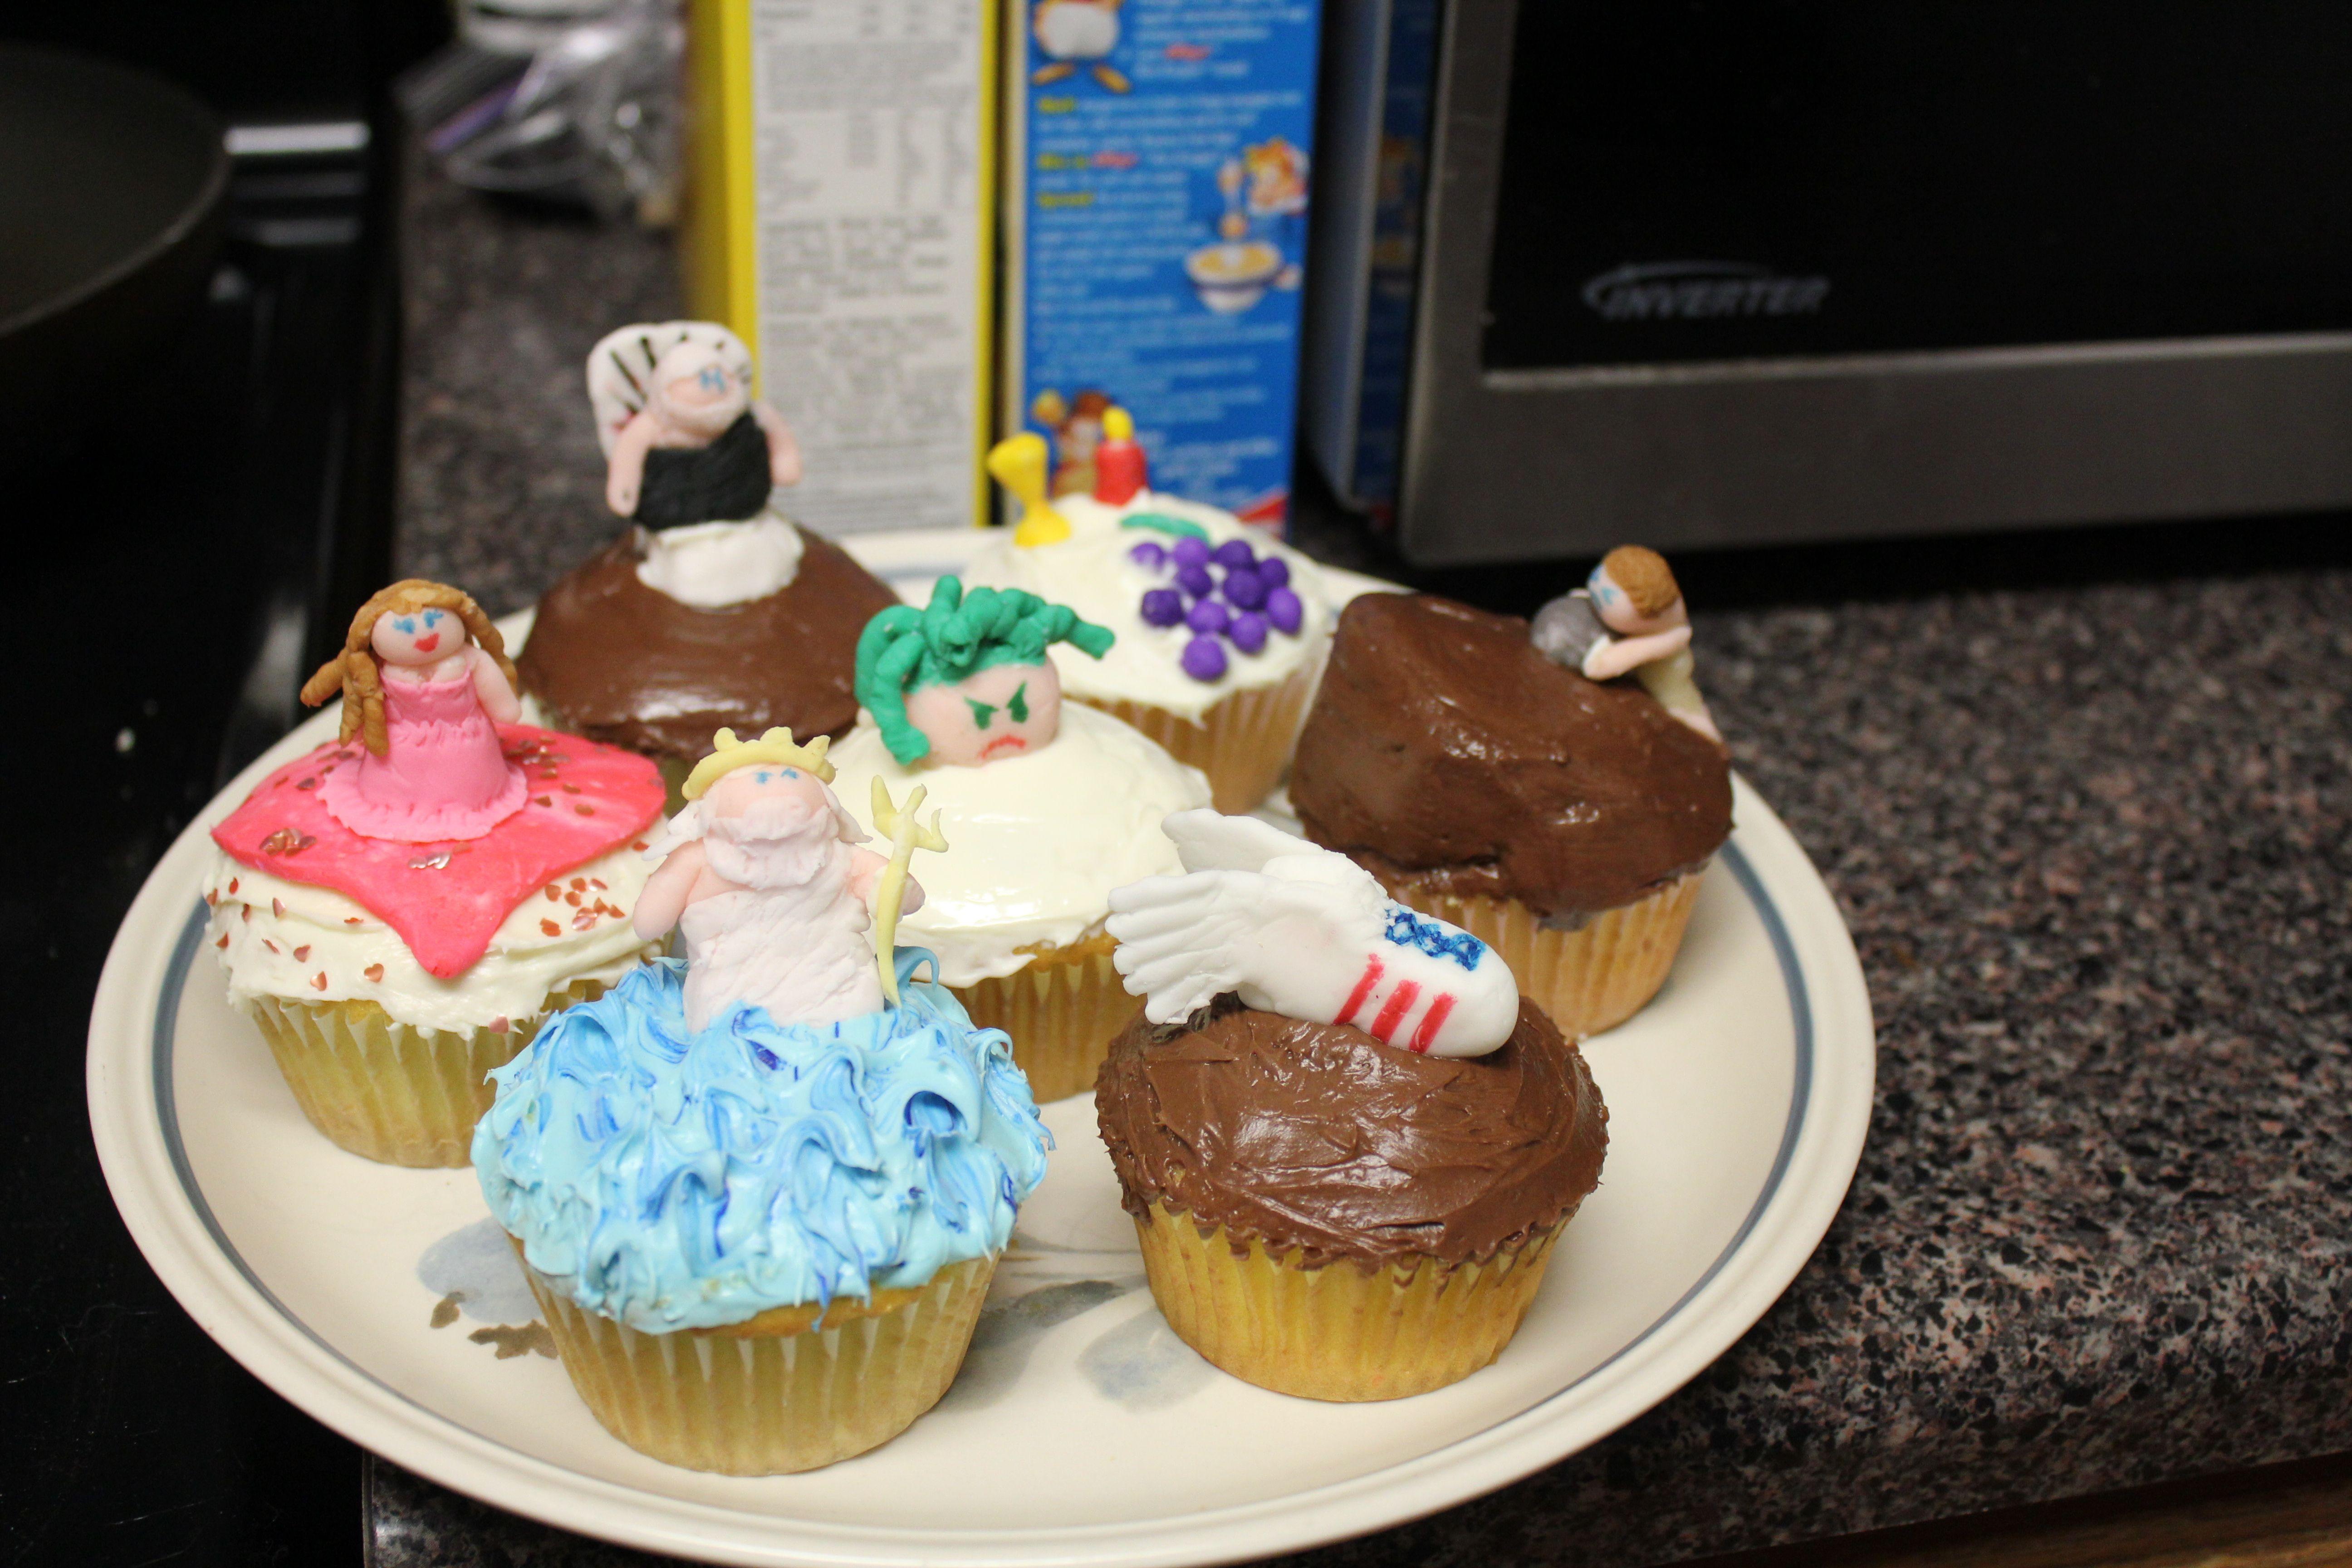 Greek Mythology - Cupcakes